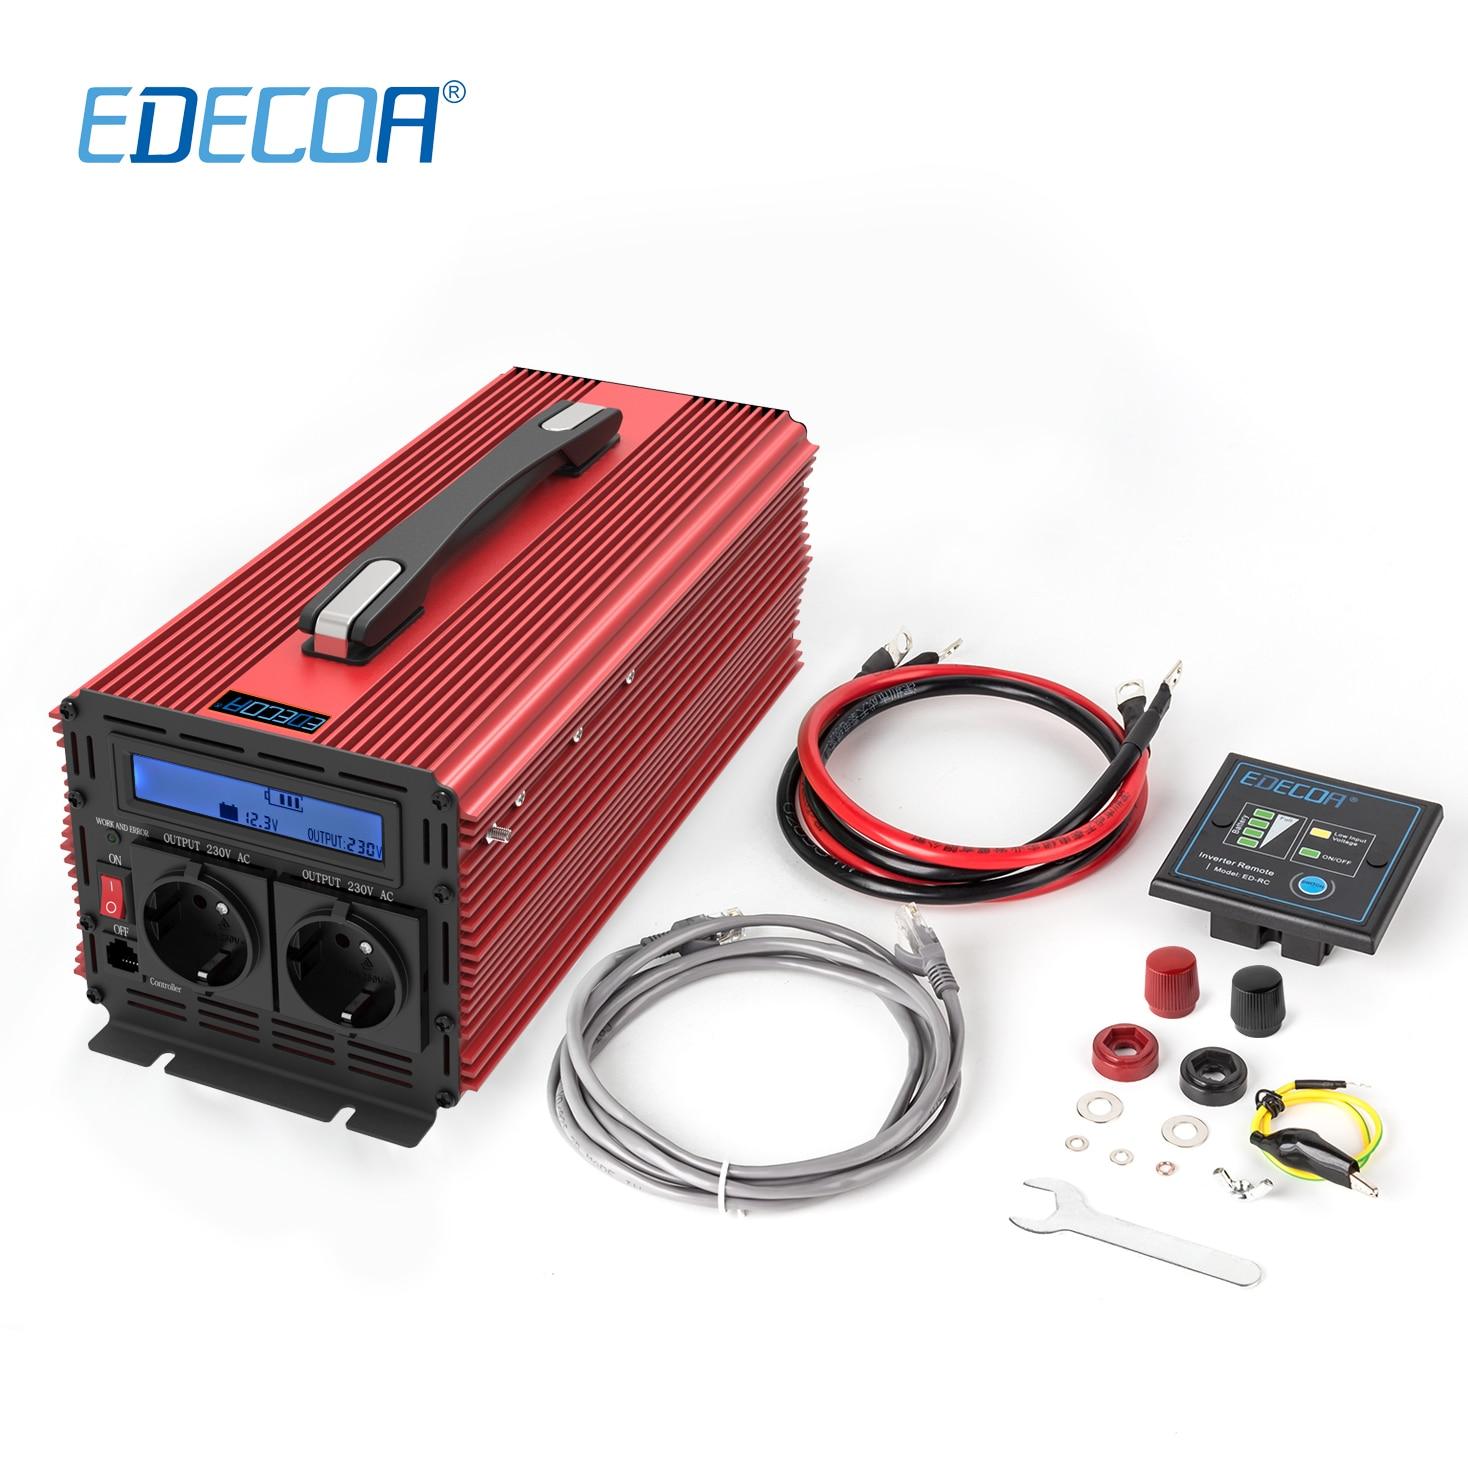 3000w DC 12v to AC 220v 230v 240v modified sine wave power inverter 6000w peak with